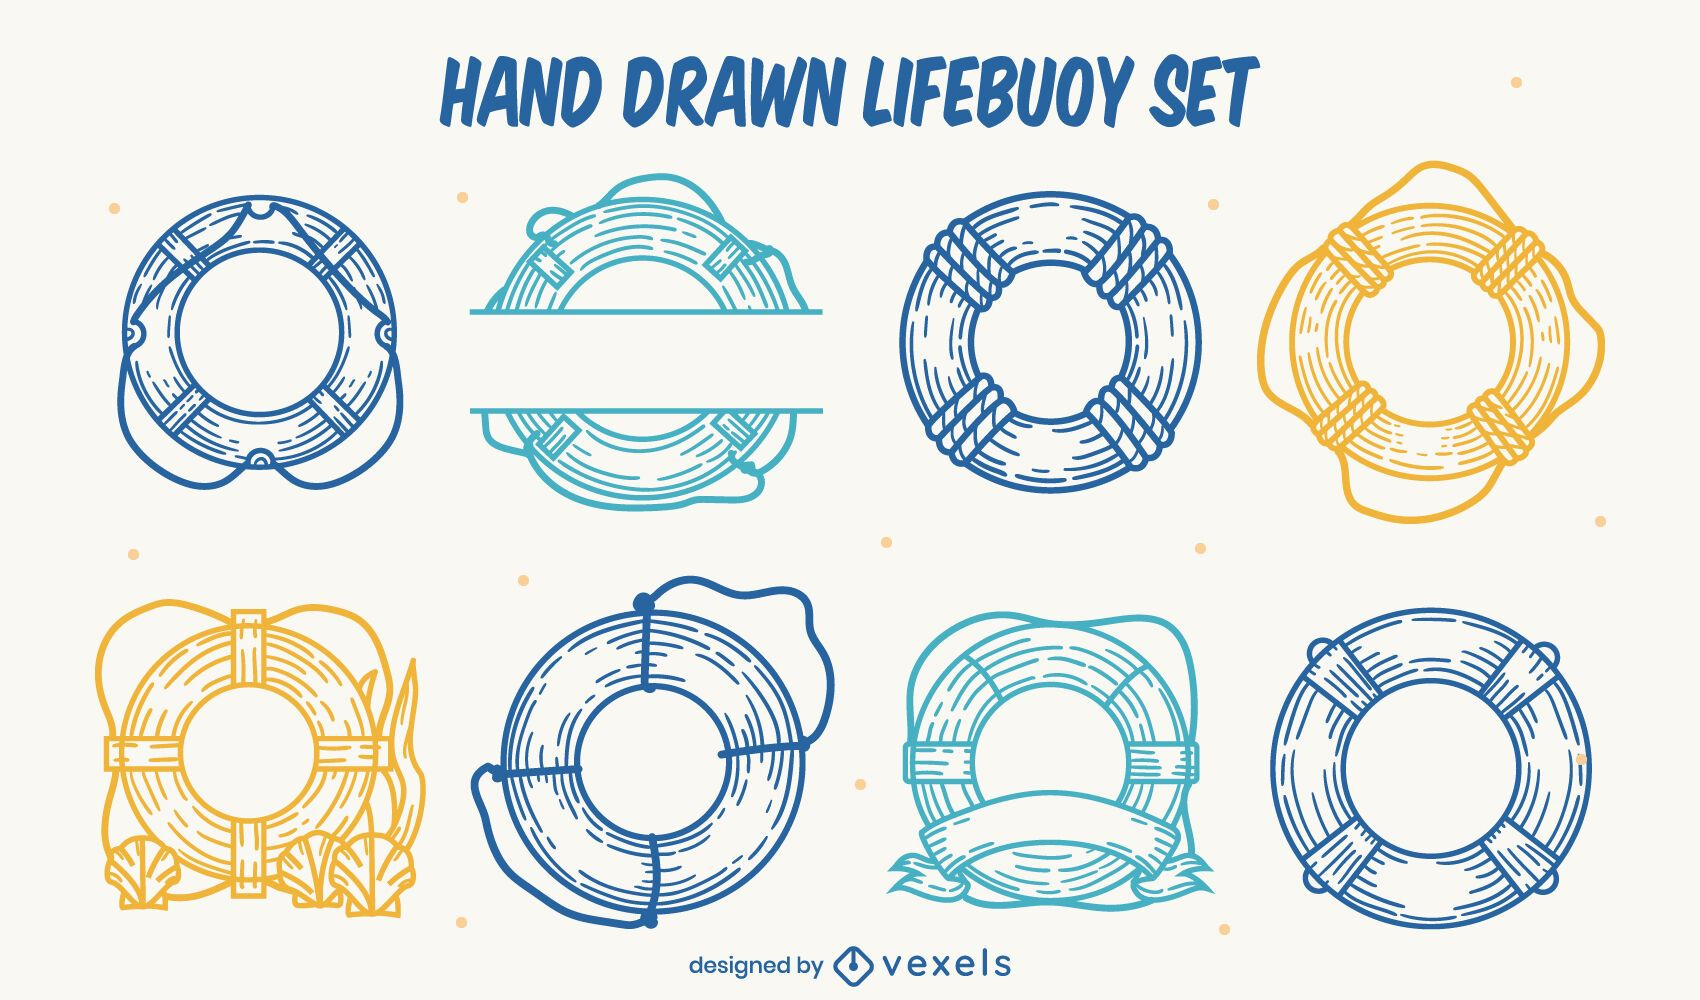 Life saver float rings hand-drawn set